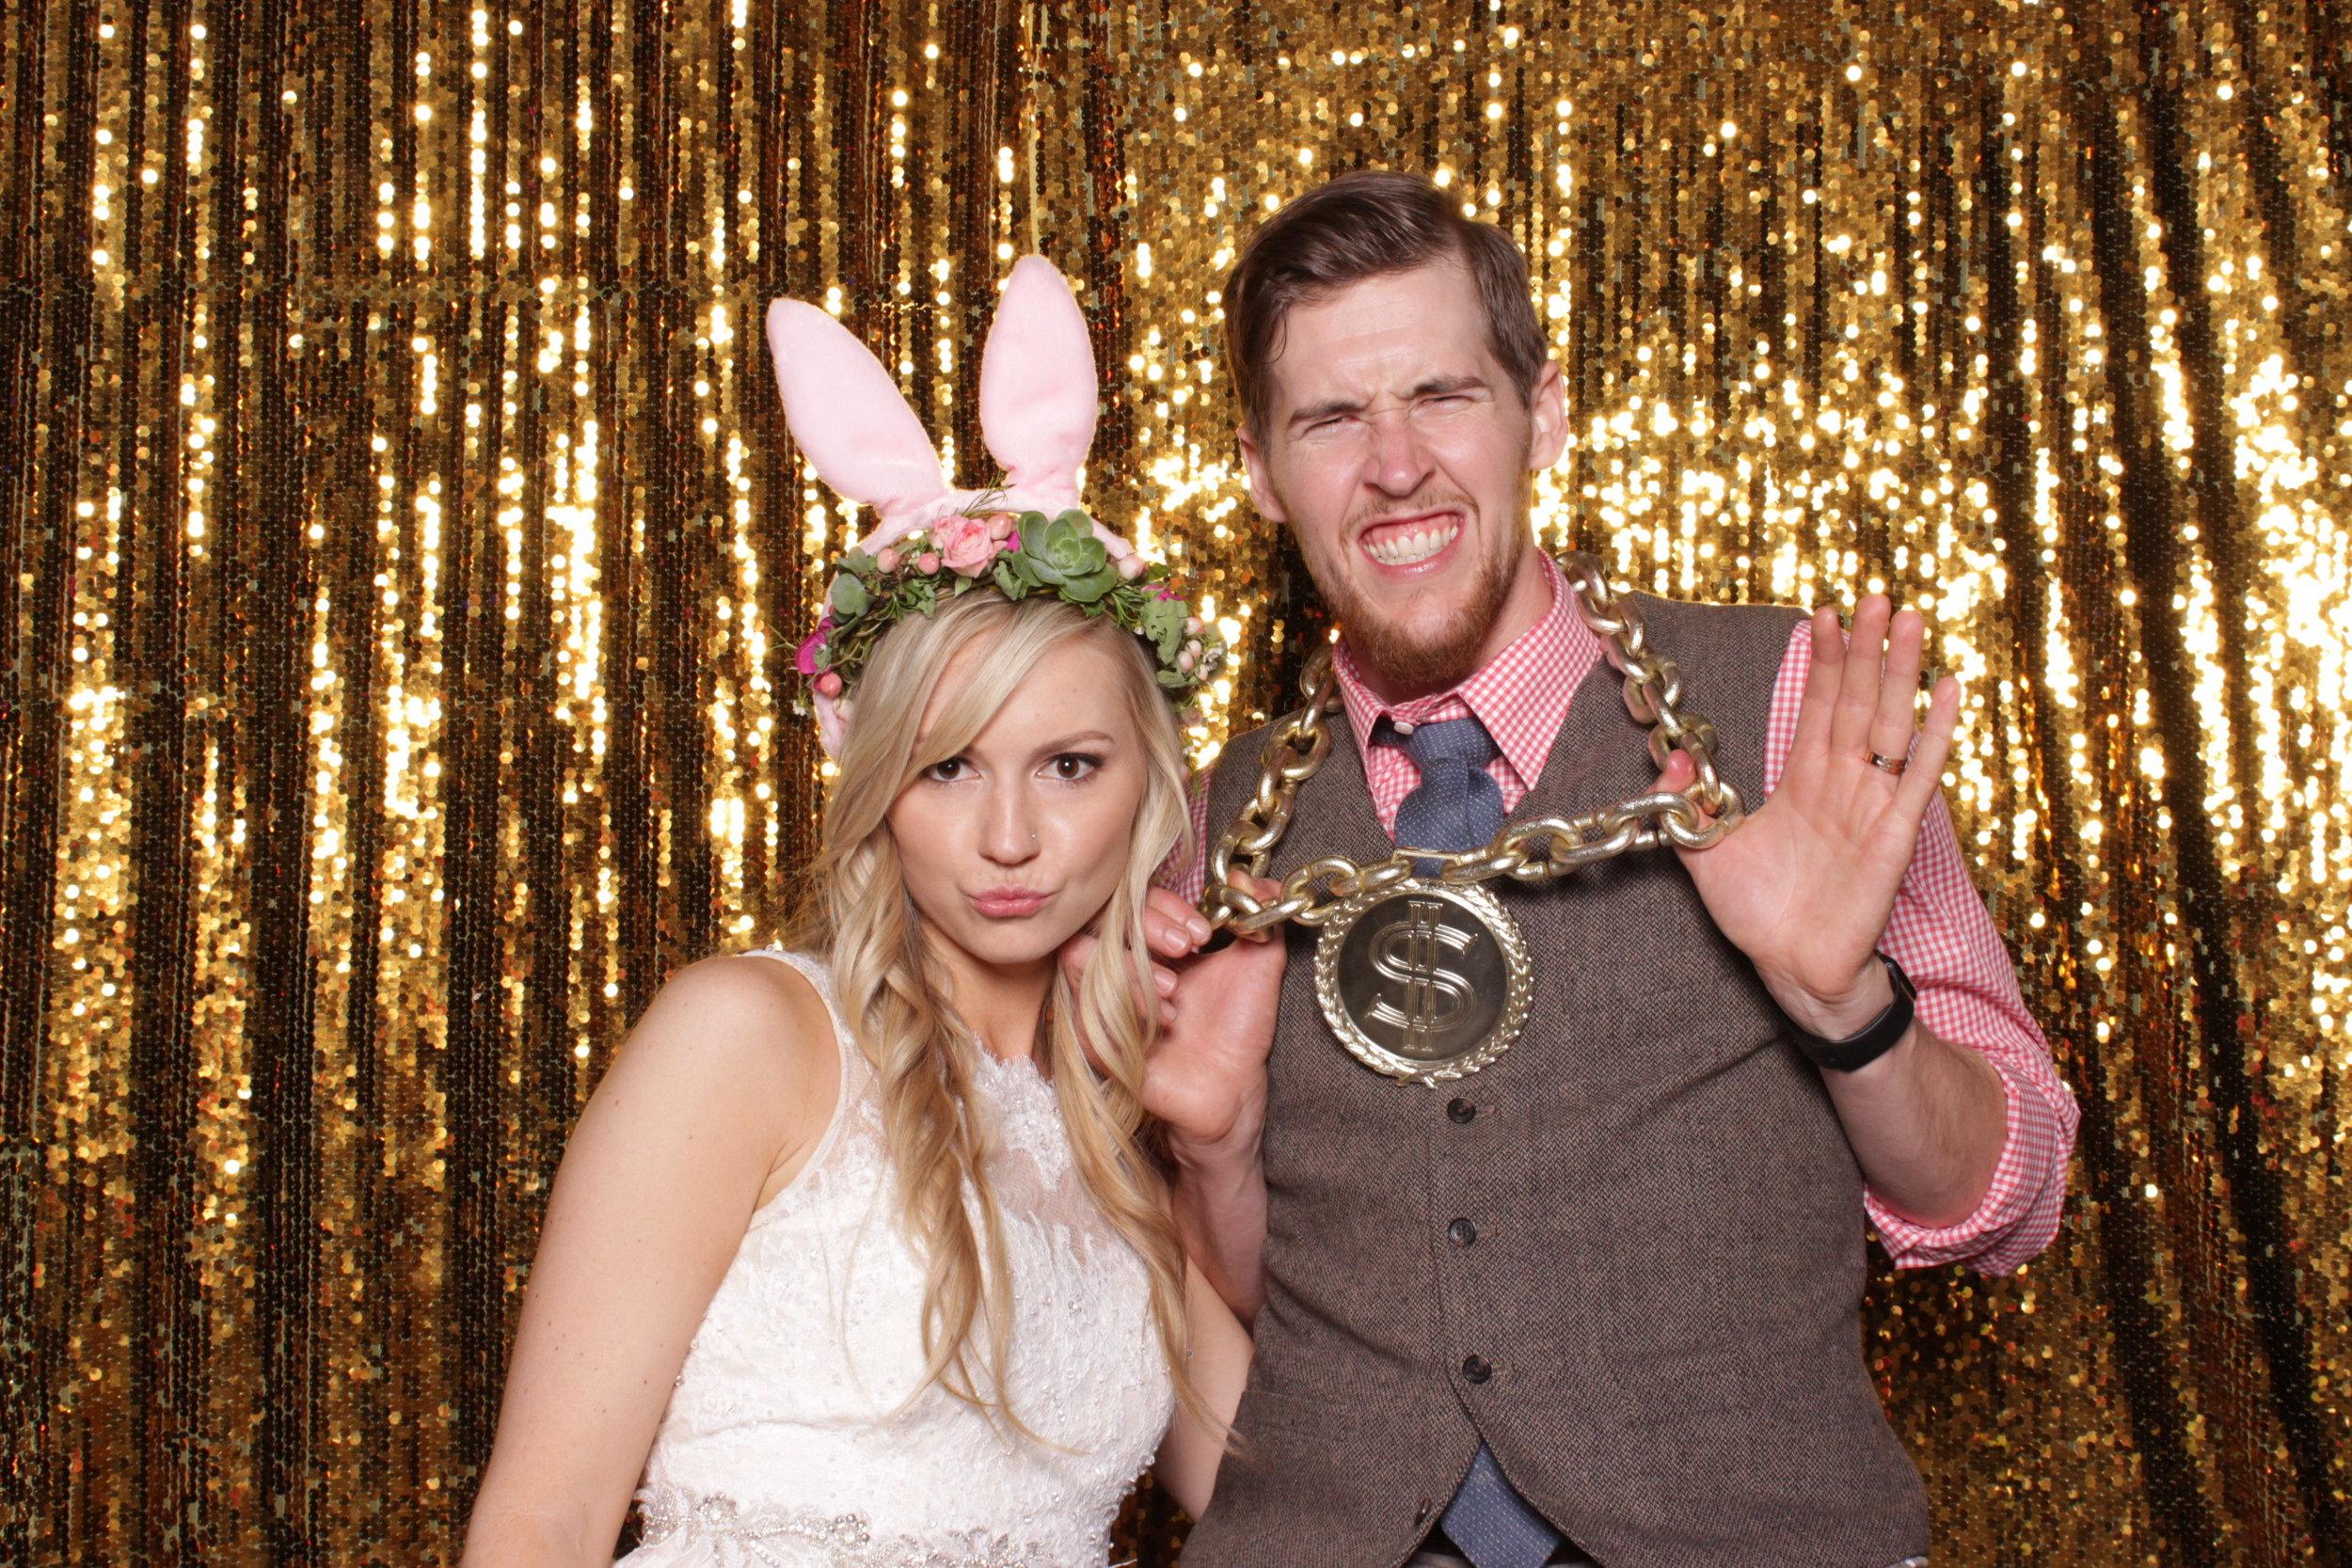 chico-wedding-photo-booth-rental-trebooth-jake-dickman-emily-brook